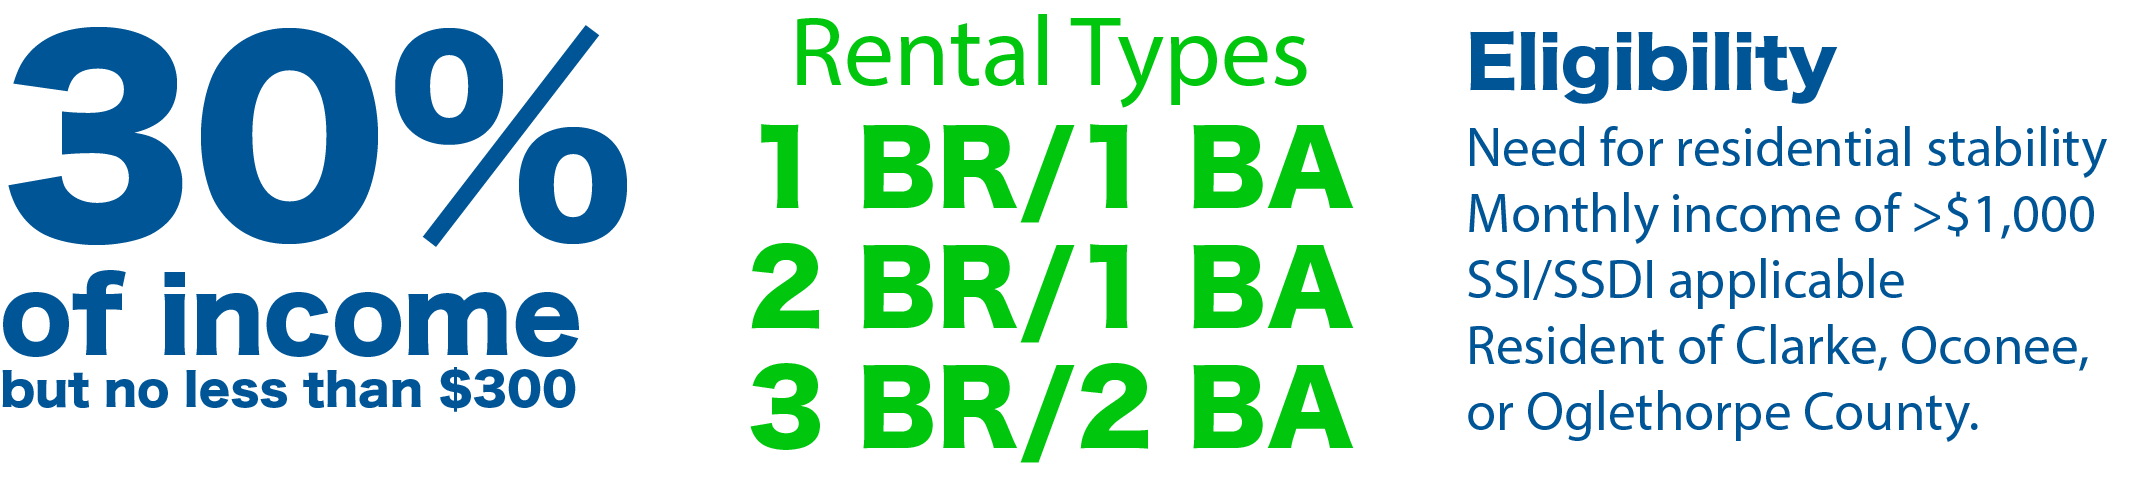 Rent Details